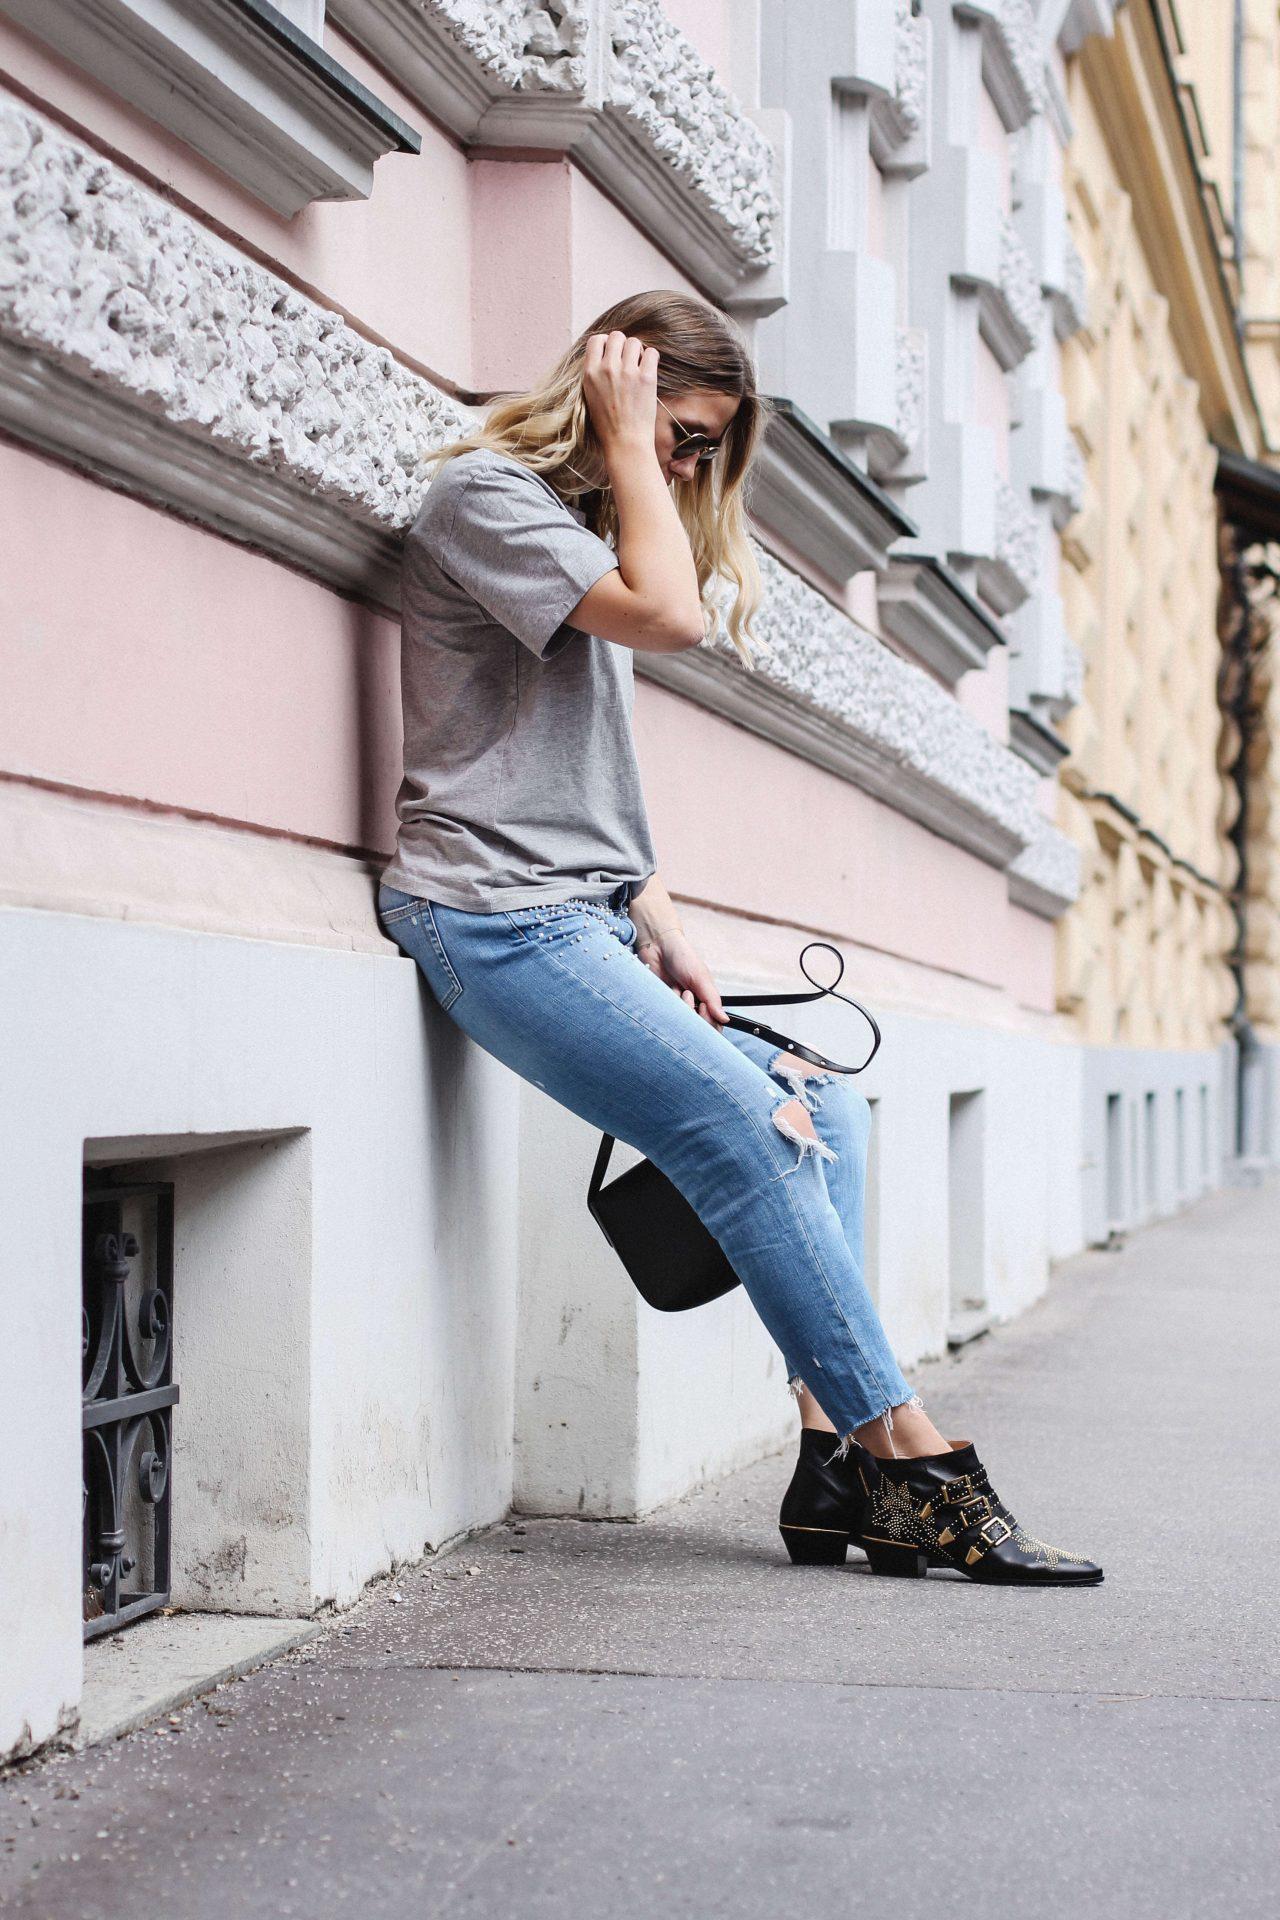 Pearls X Susanna Dream Come True Tifmys Fashion Blog